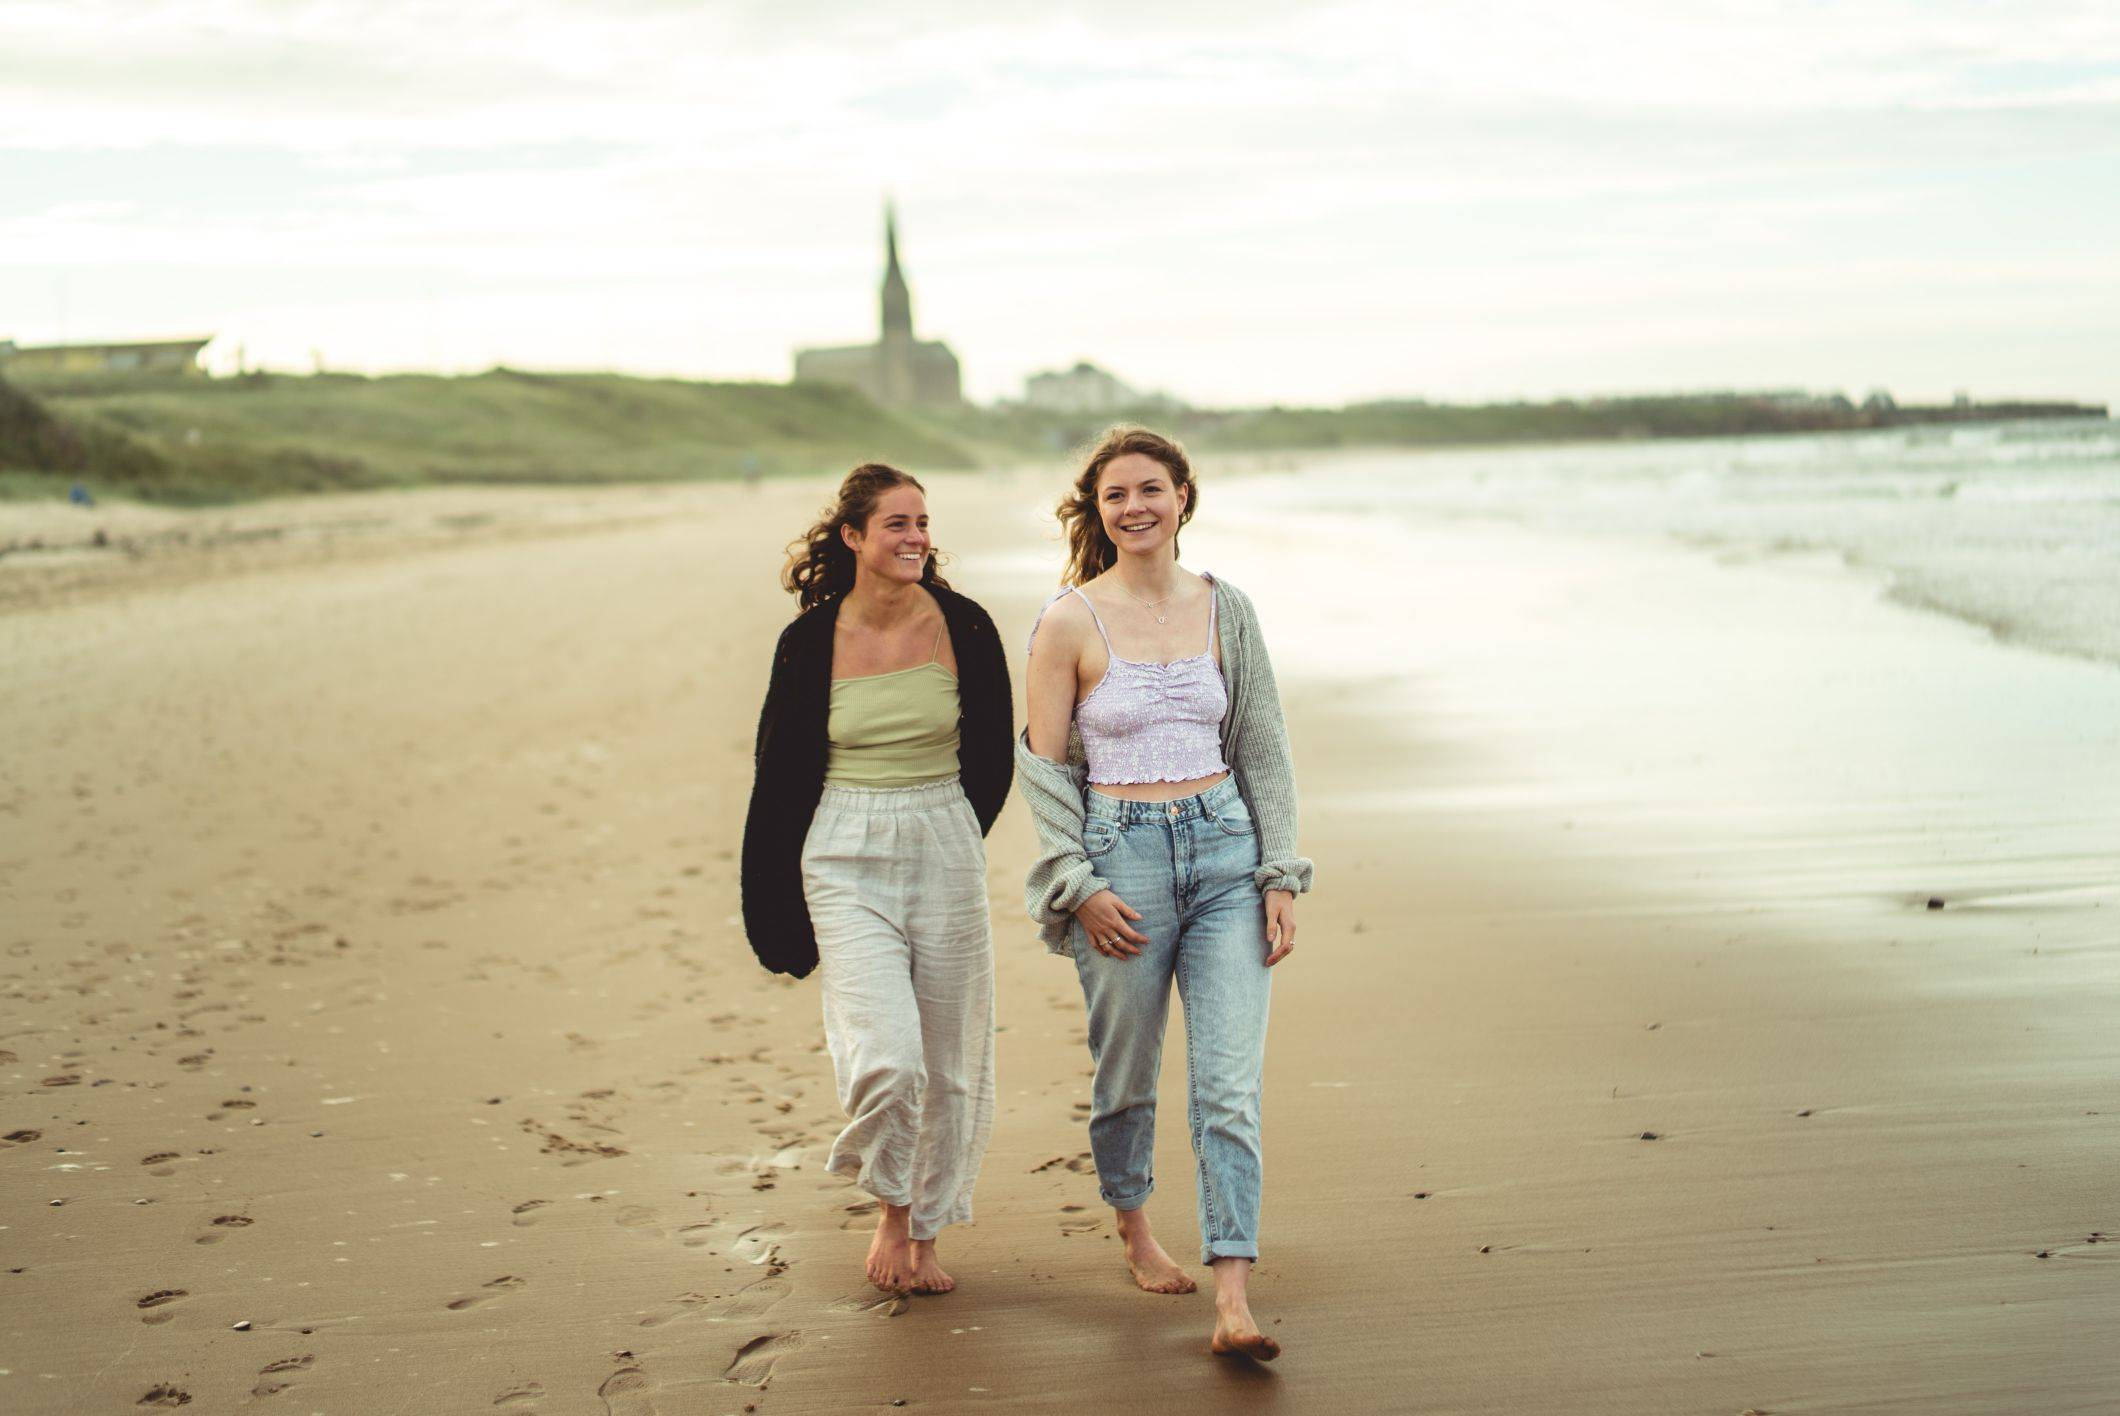 Image of chloe and georgie on beach